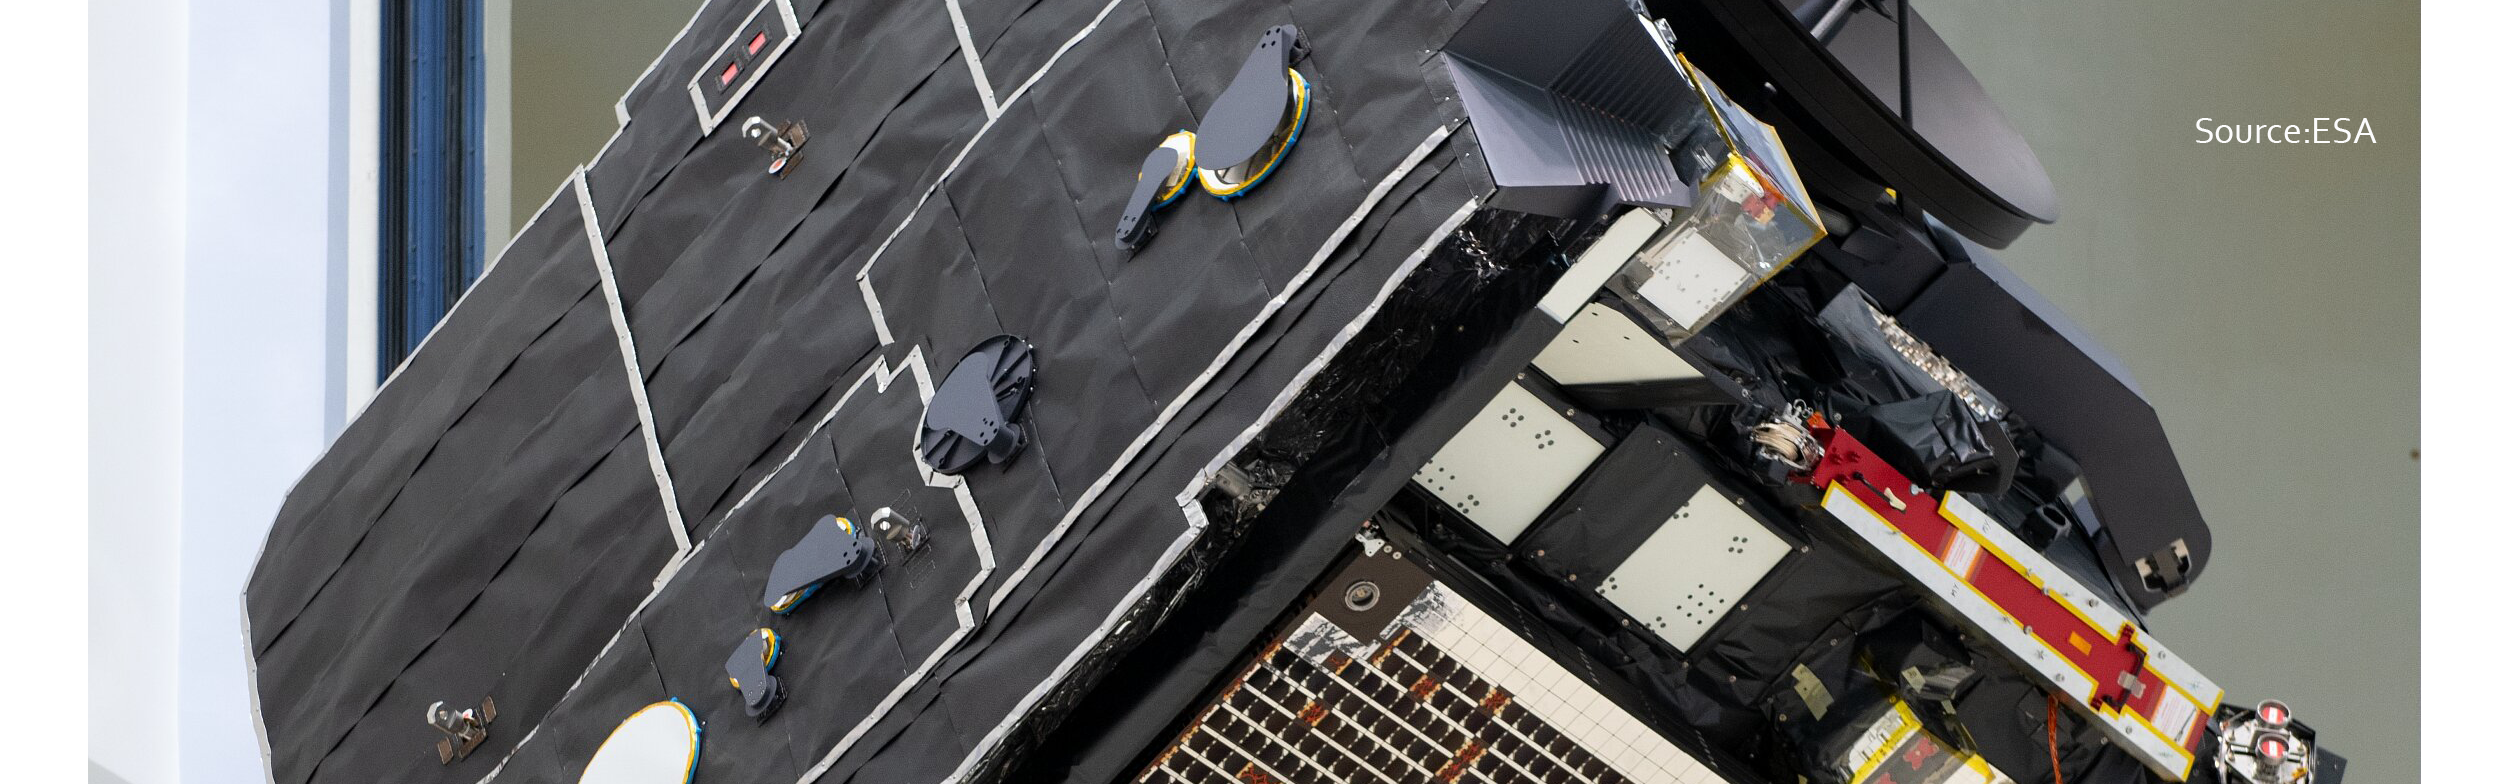 Solar Orbiter moves to launch site – complete with Enbio's SolarBlack coated heatshield!